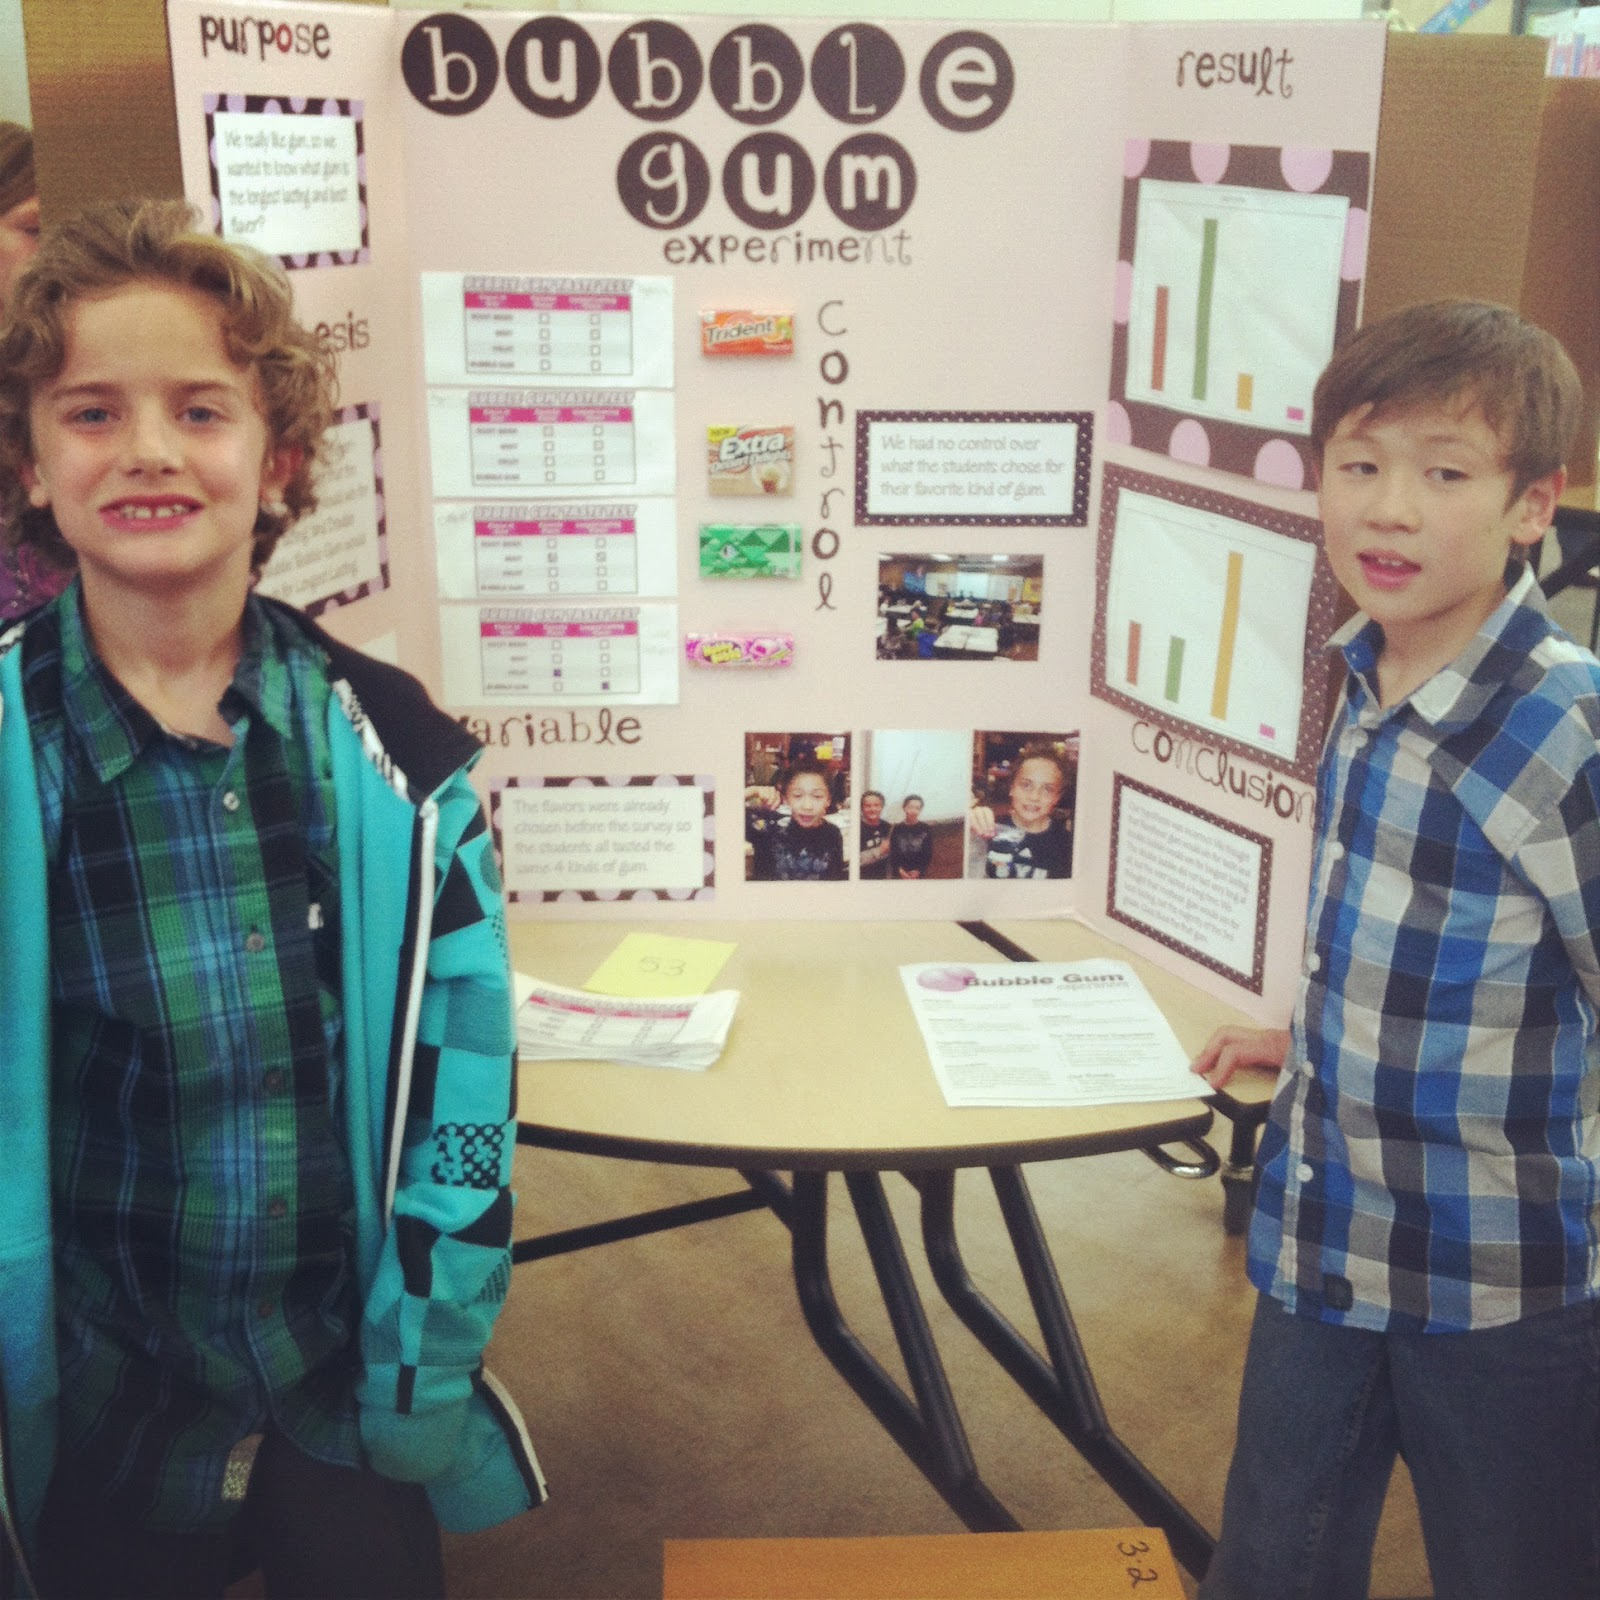 Fackrellfamilyadventures The Science Fair